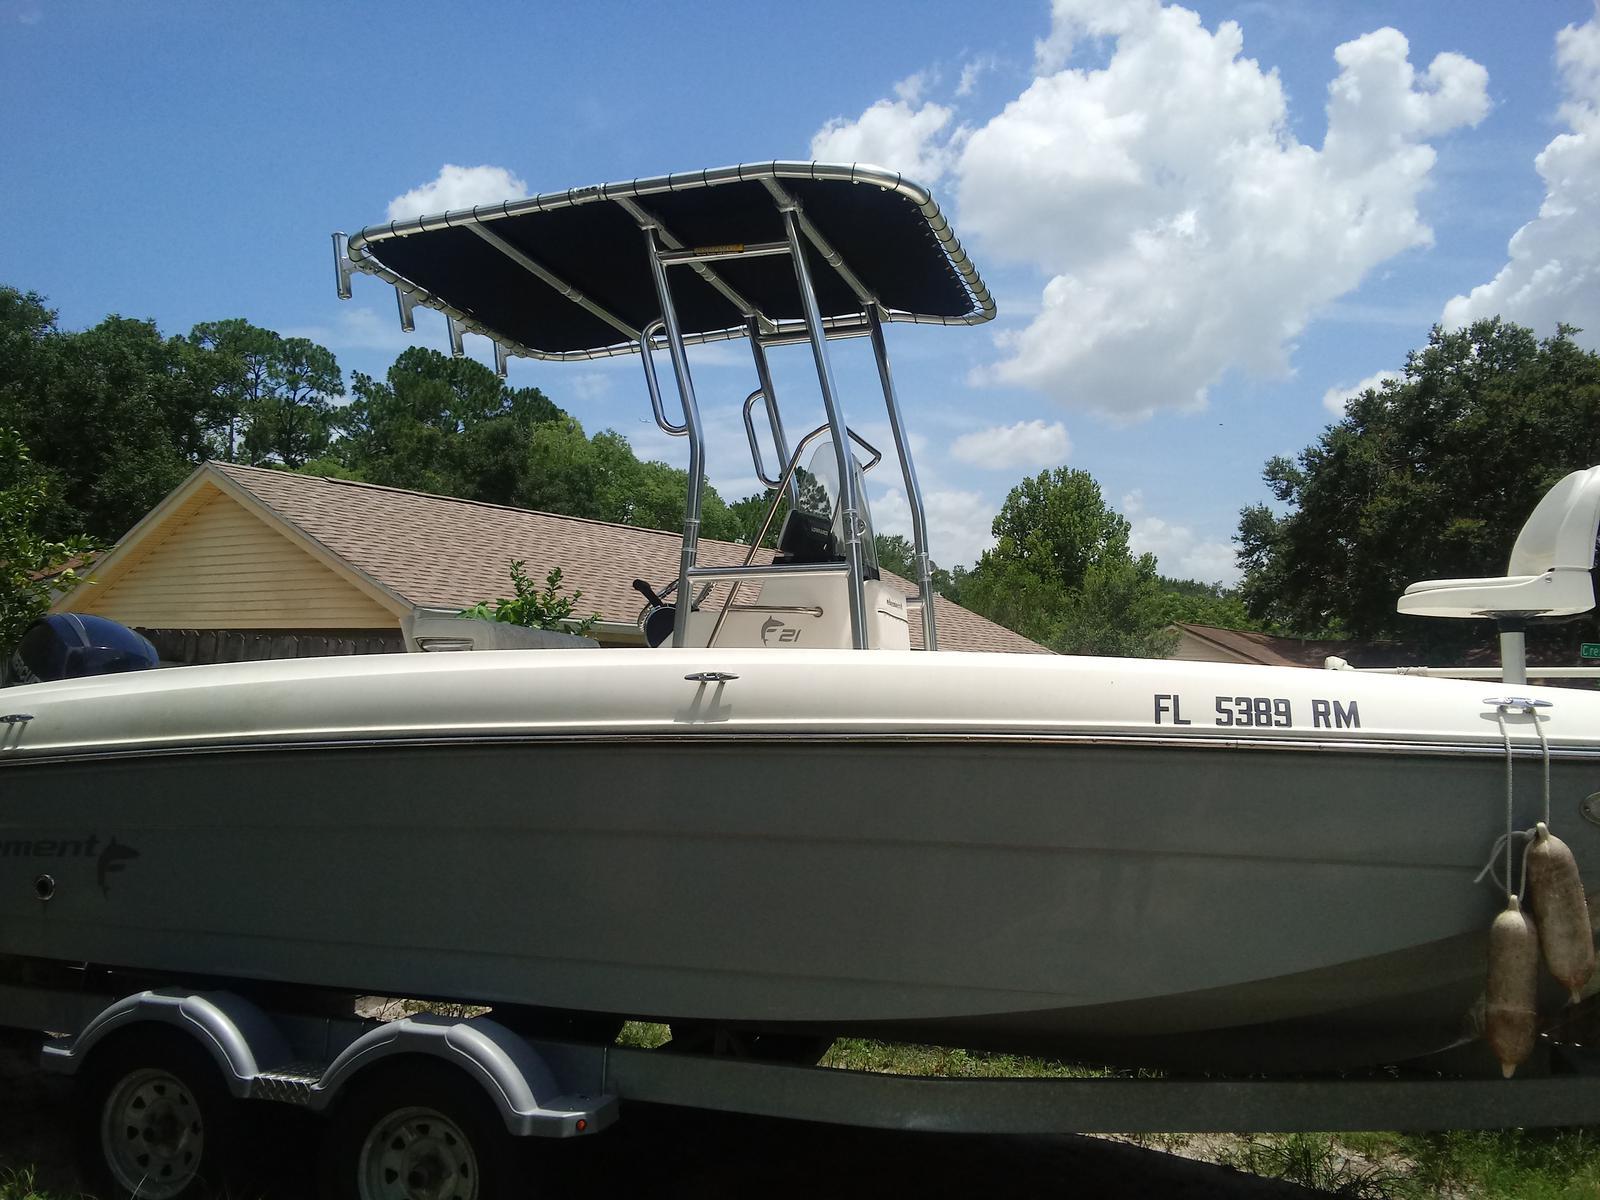 Boats from Bayliner BMC Boats Longwood, FL (407) 585-3190